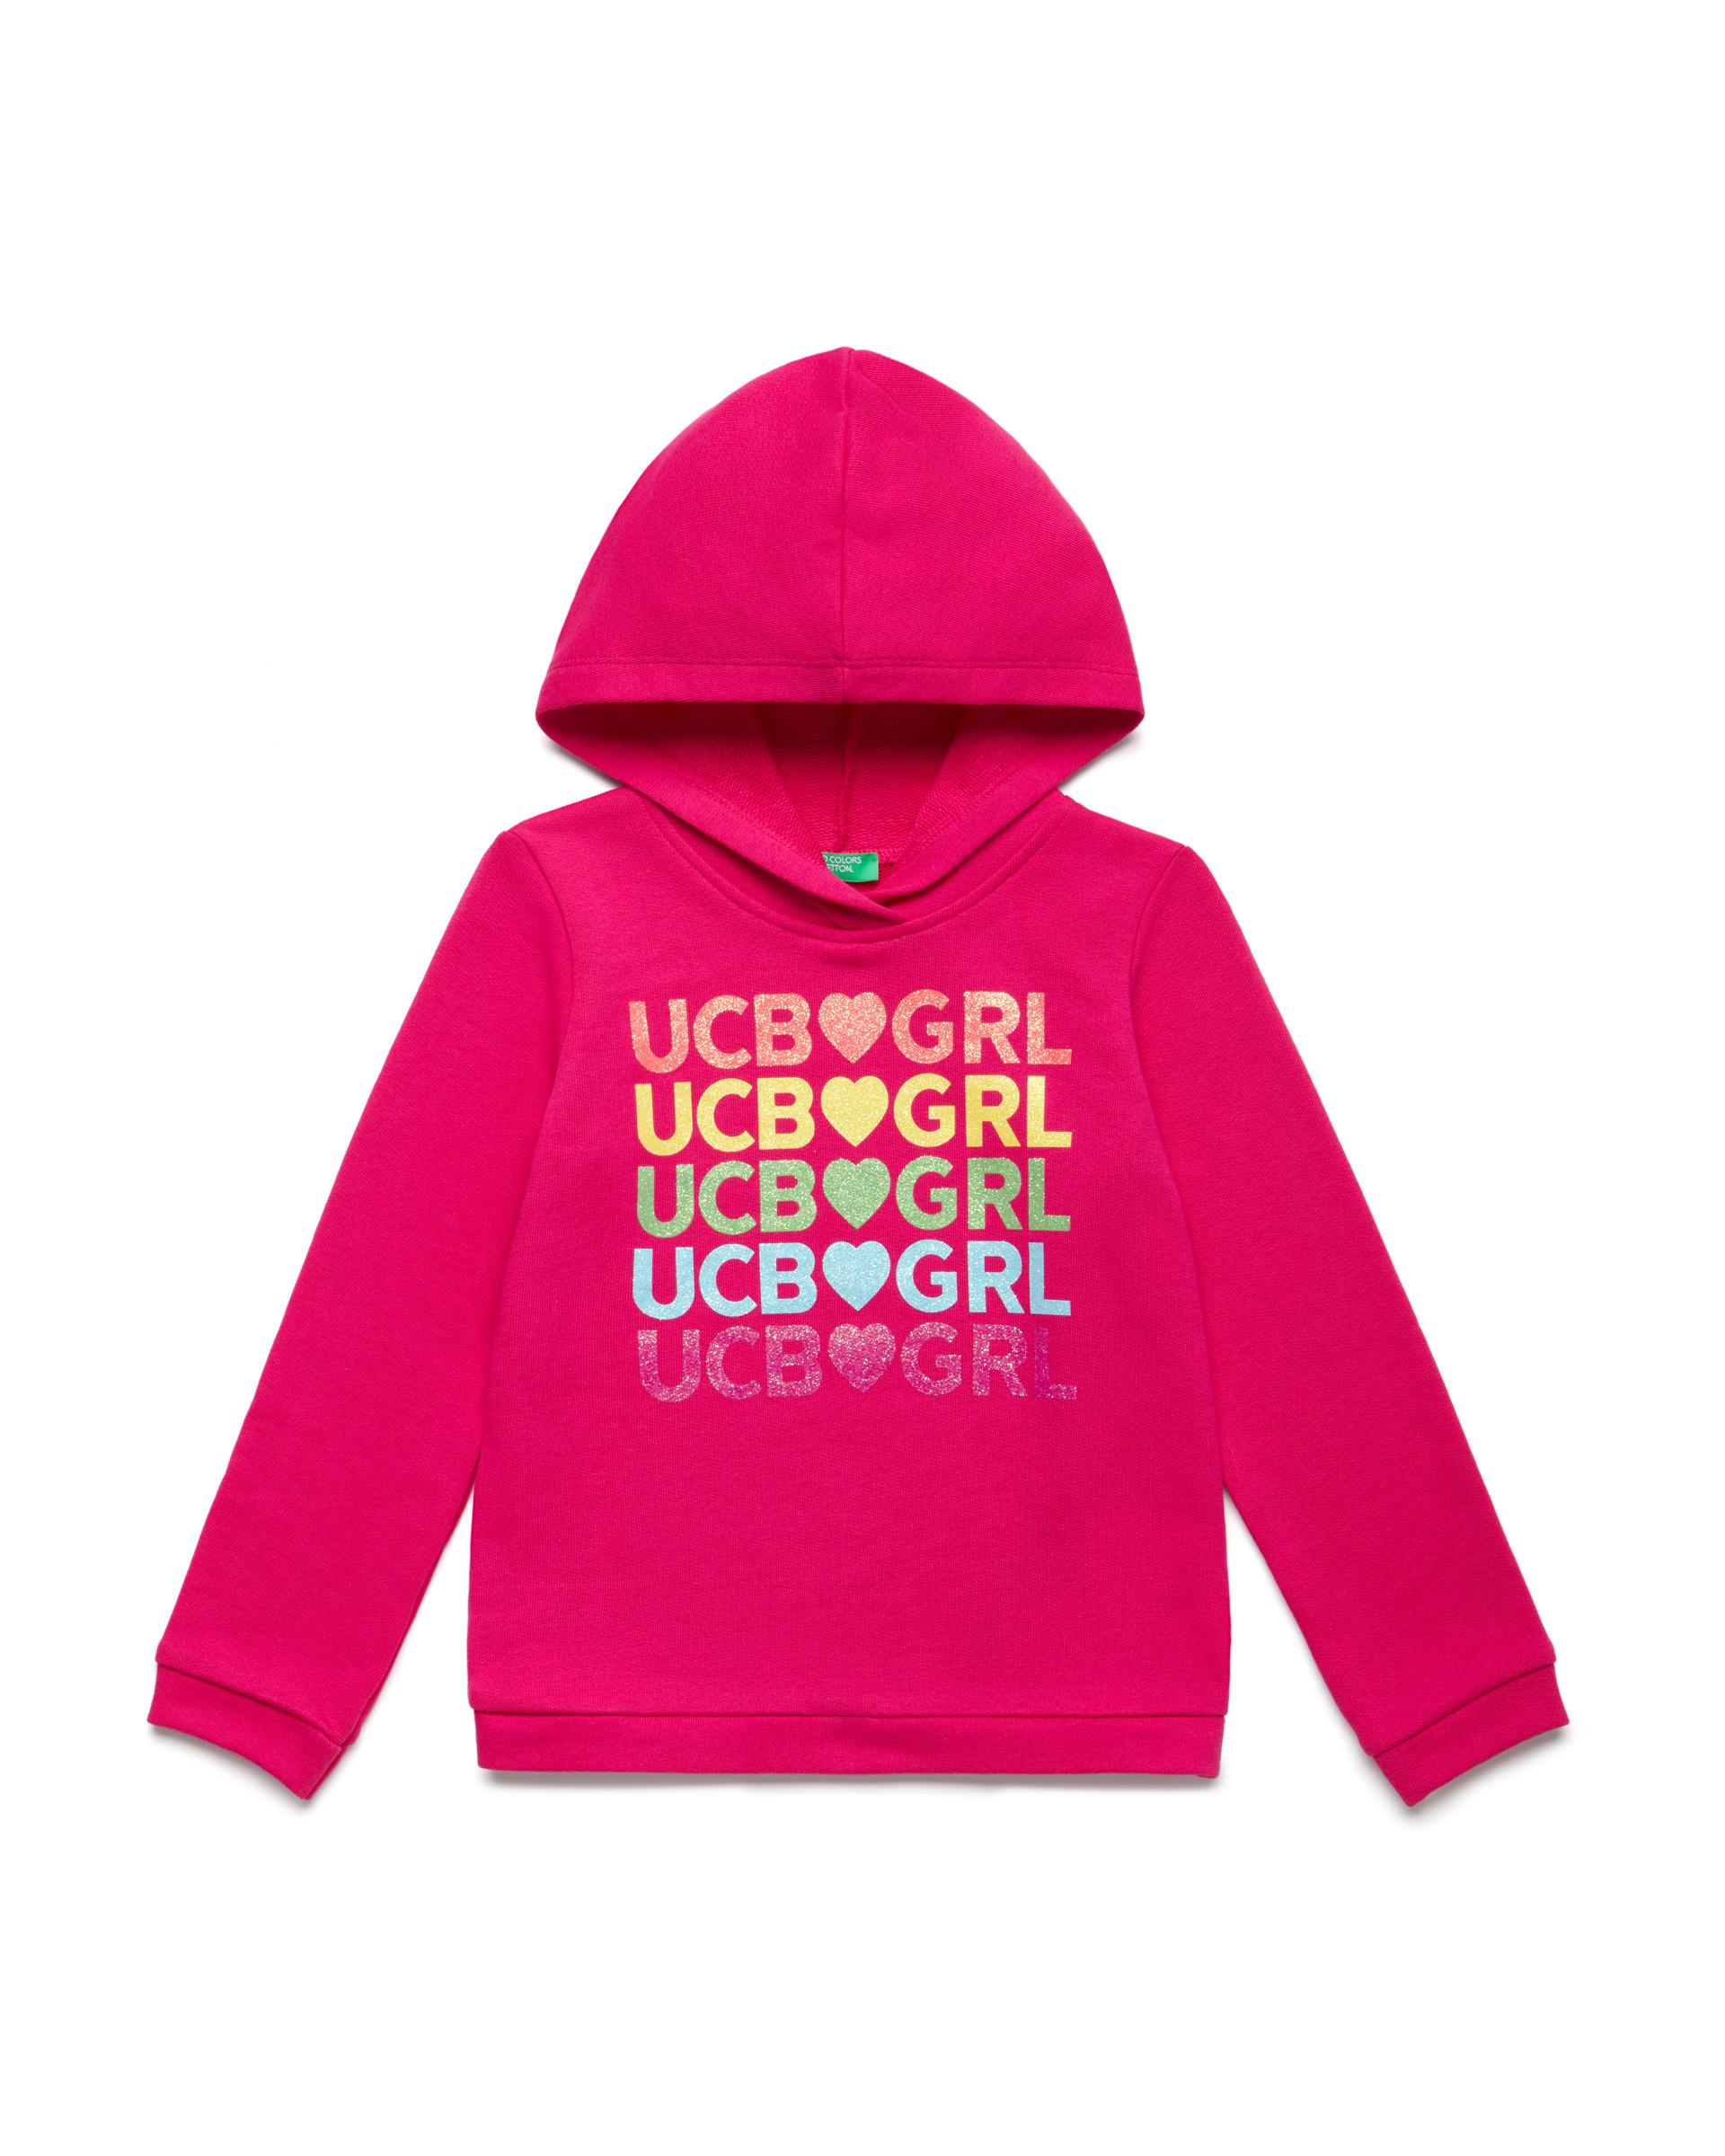 Купить 20P_3J68C2171_2L3, Толстовка для девочек Benetton 3J68C2171_2L3 р-р 110, United Colors of Benetton, Толстовки для девочек